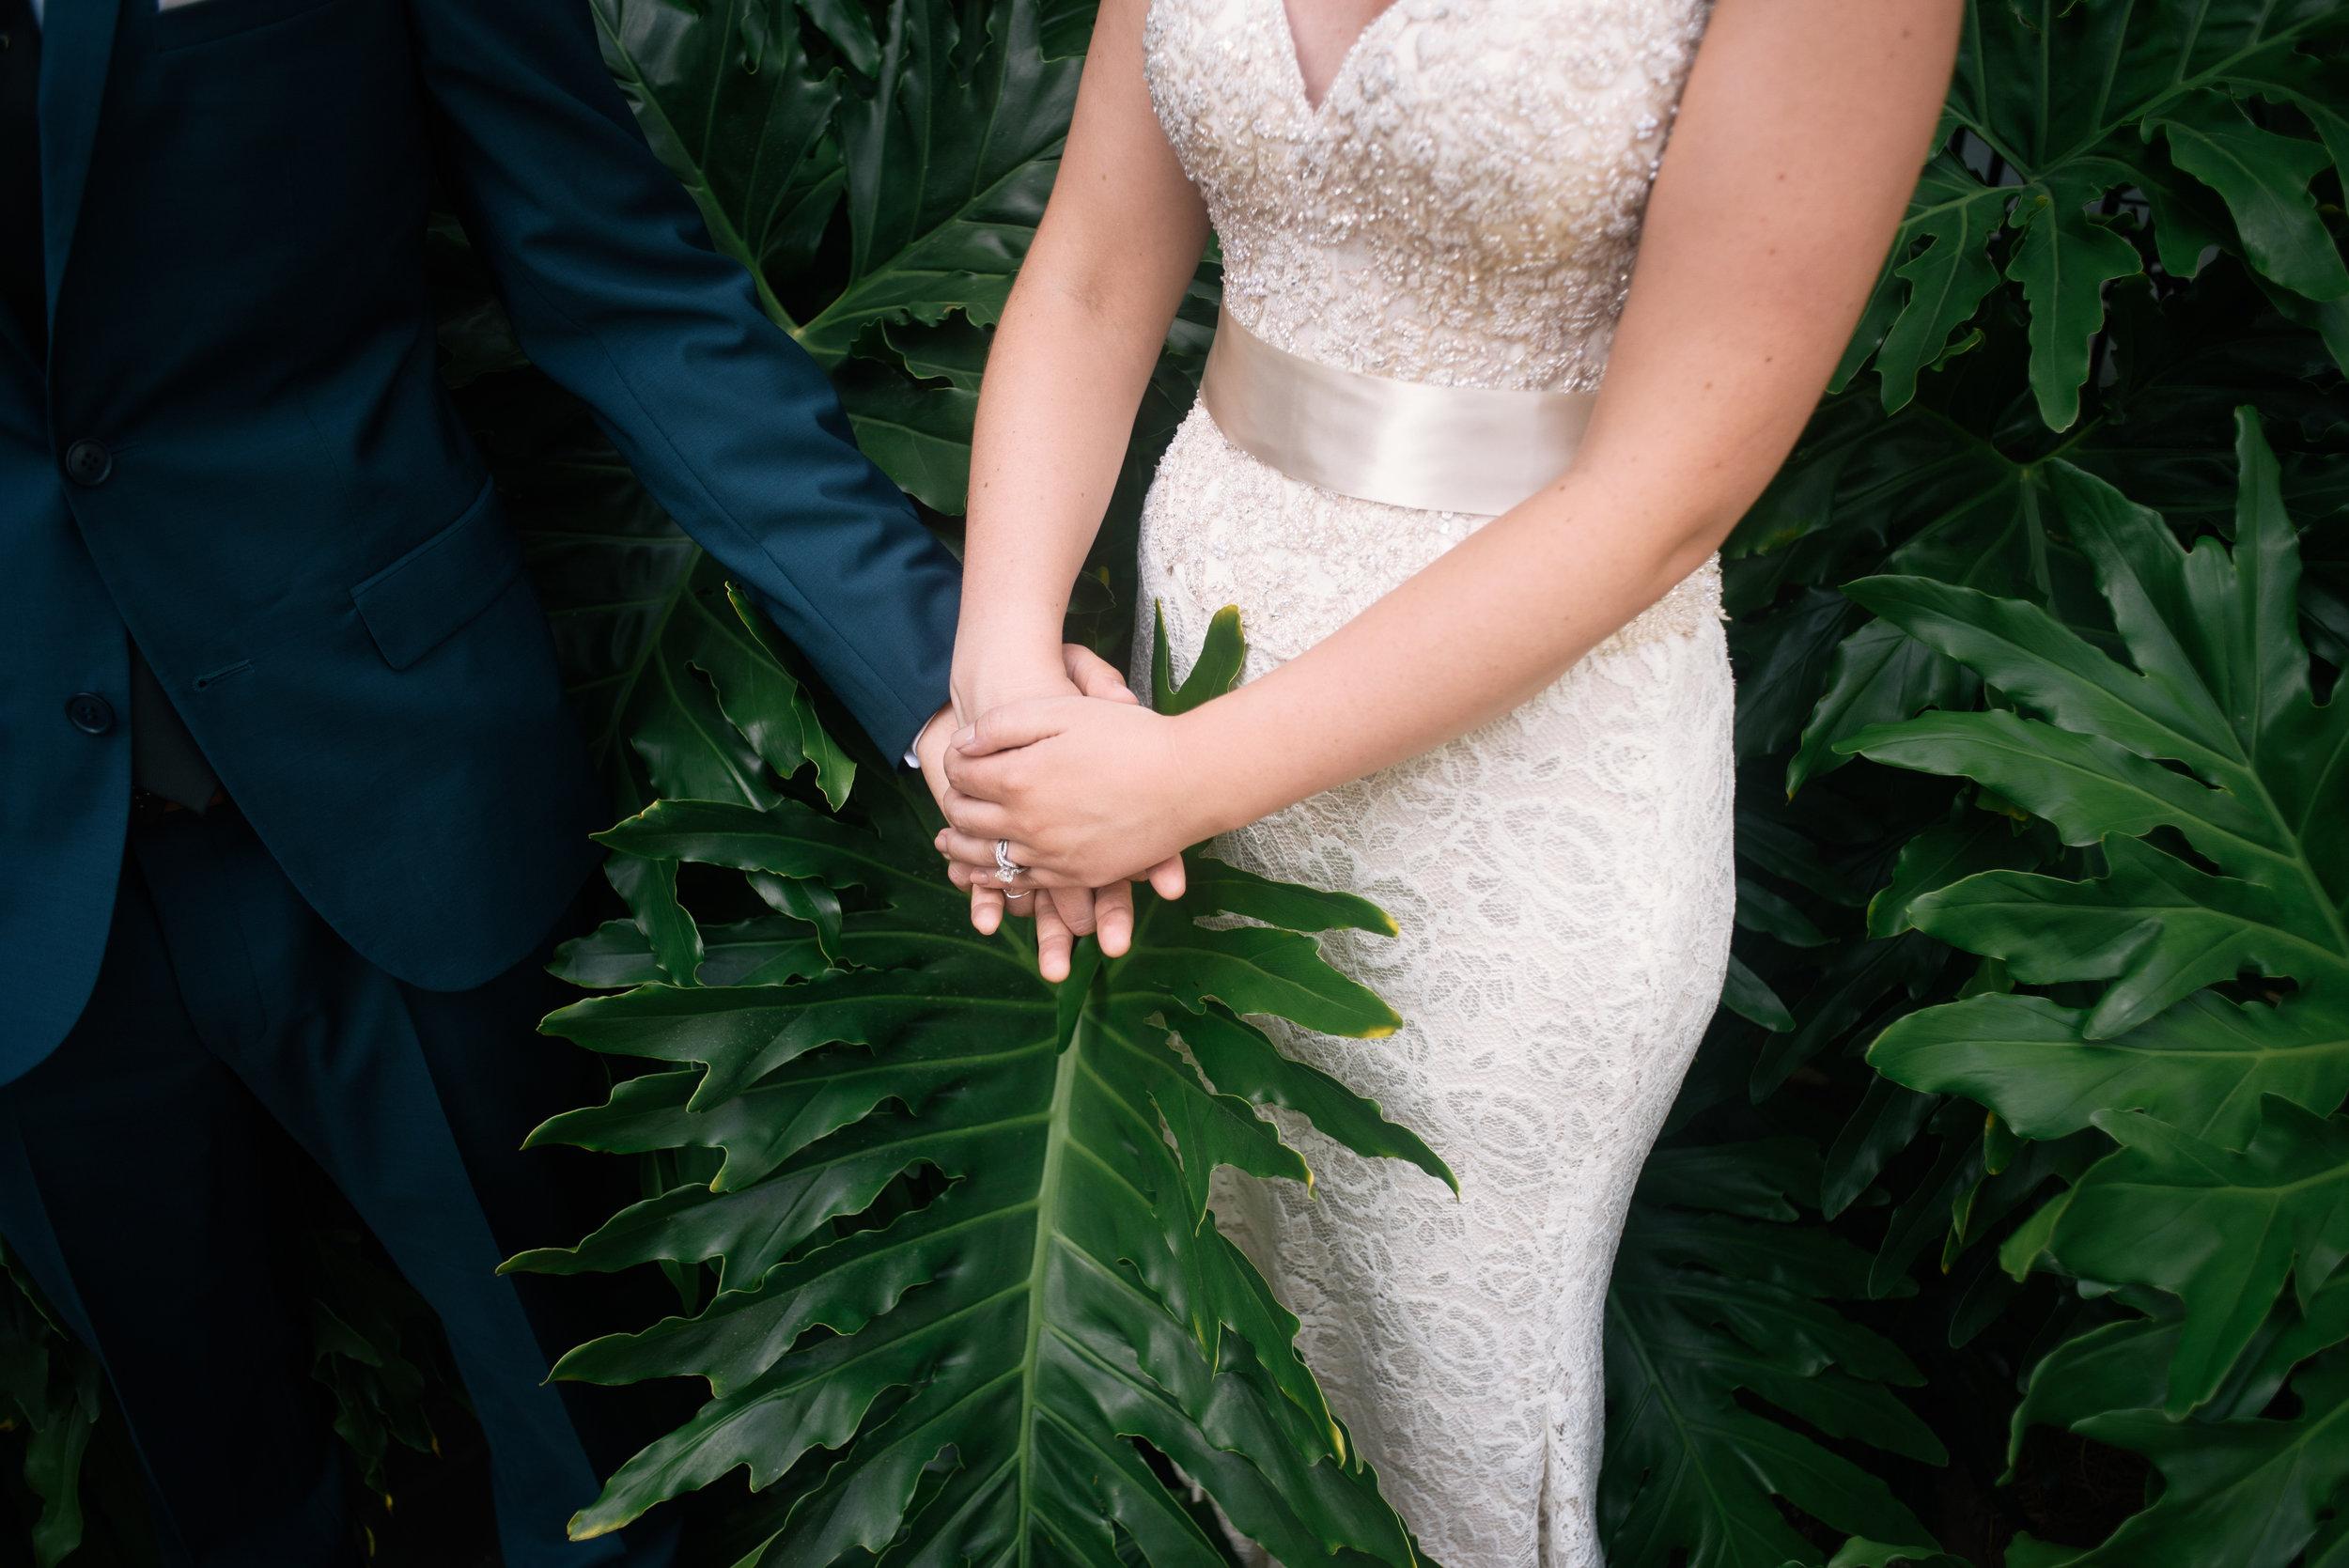 savannah-station-elopement-photographer-savannah-elopement-photography-savannah-georgia-elopement-photographer-savannah-wedding-photographer-meg-hill-photo-jade-hill- (26 of 93).jpg